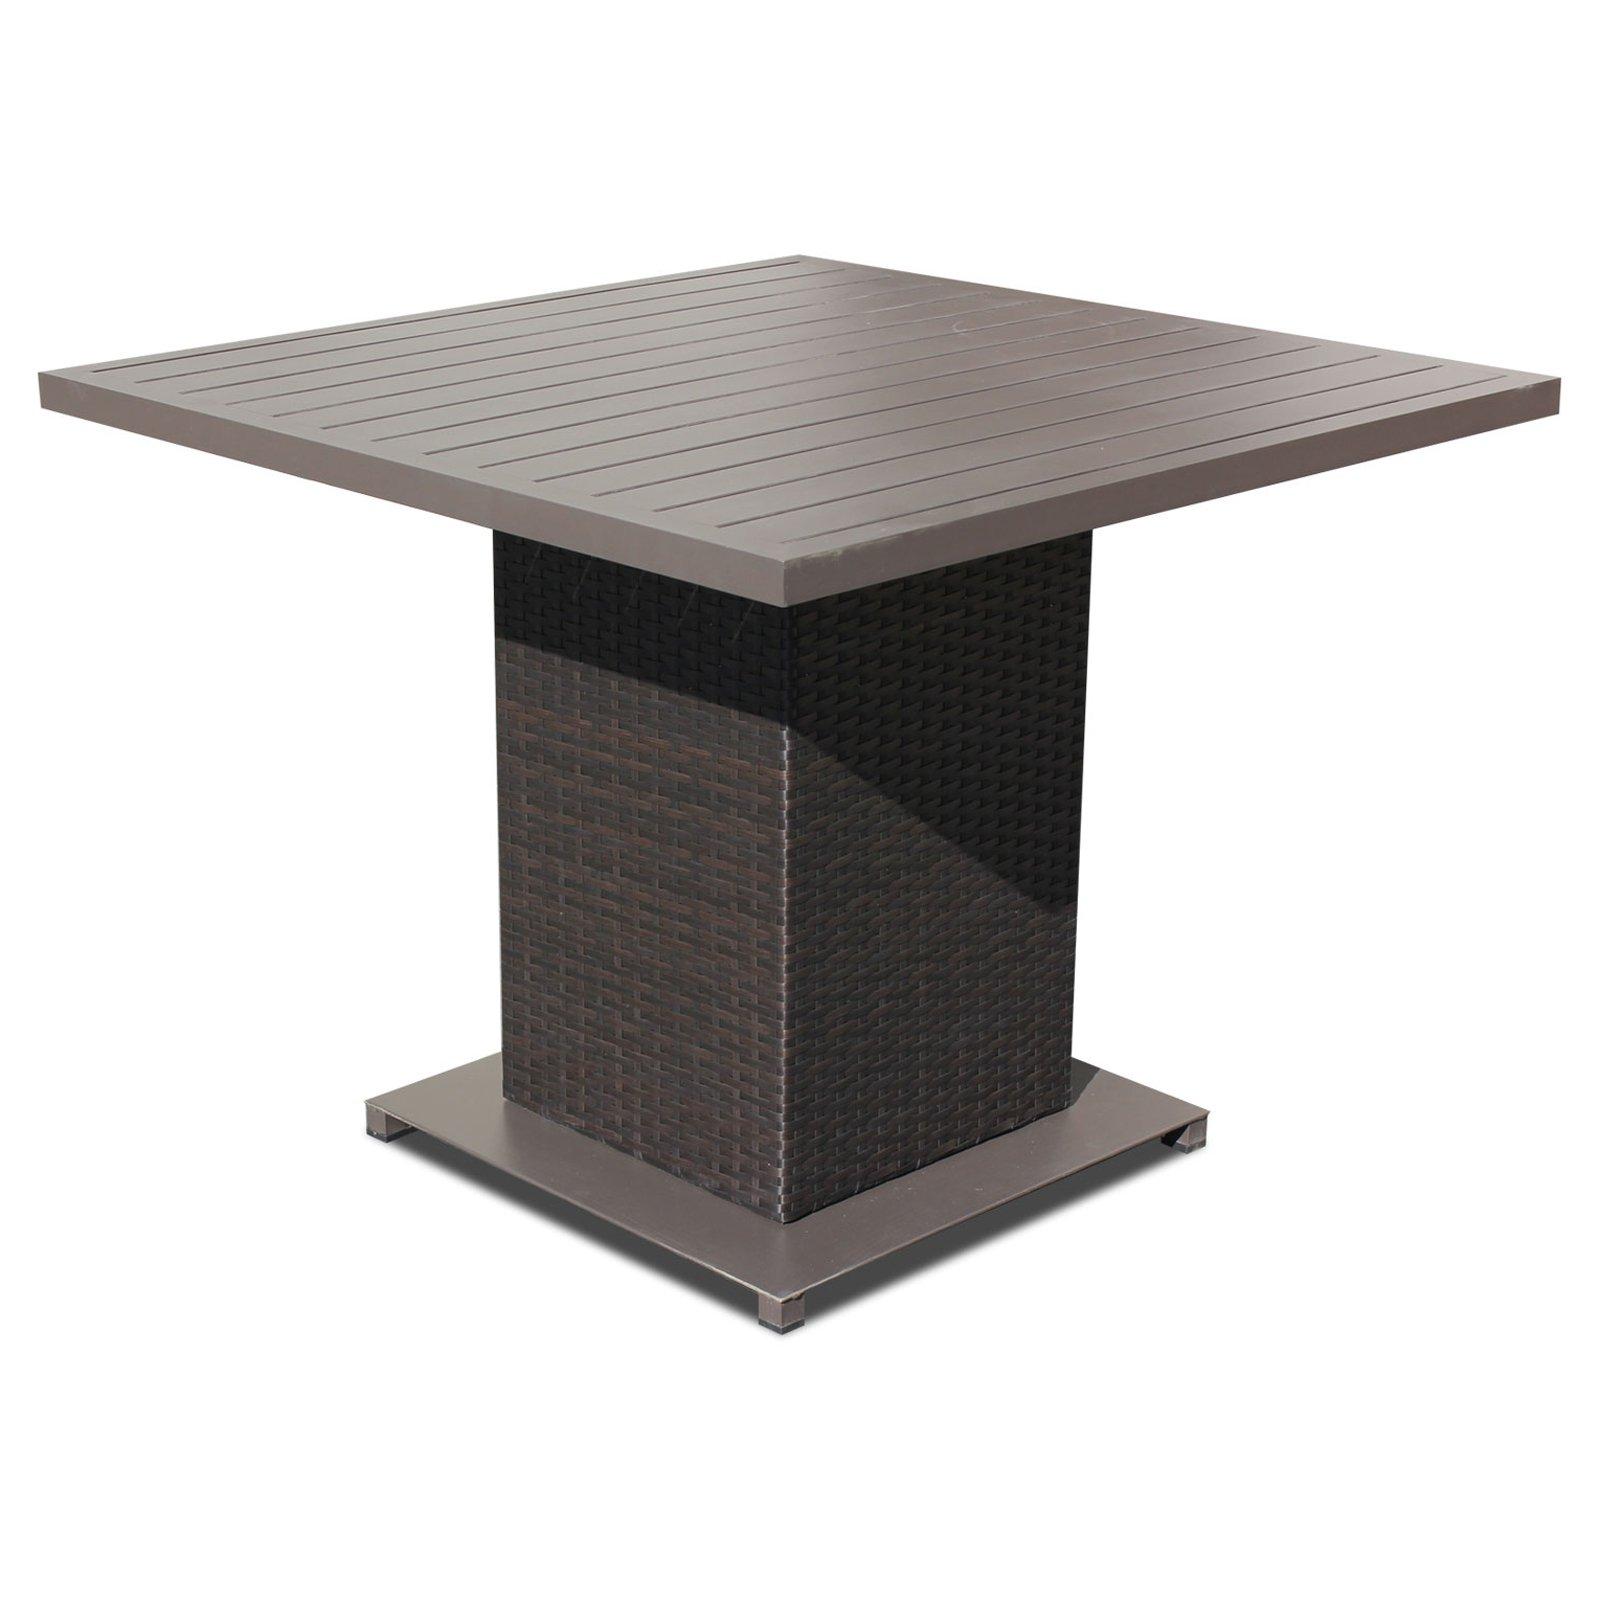 Outdoor tk classics napa wicker square patio dining table